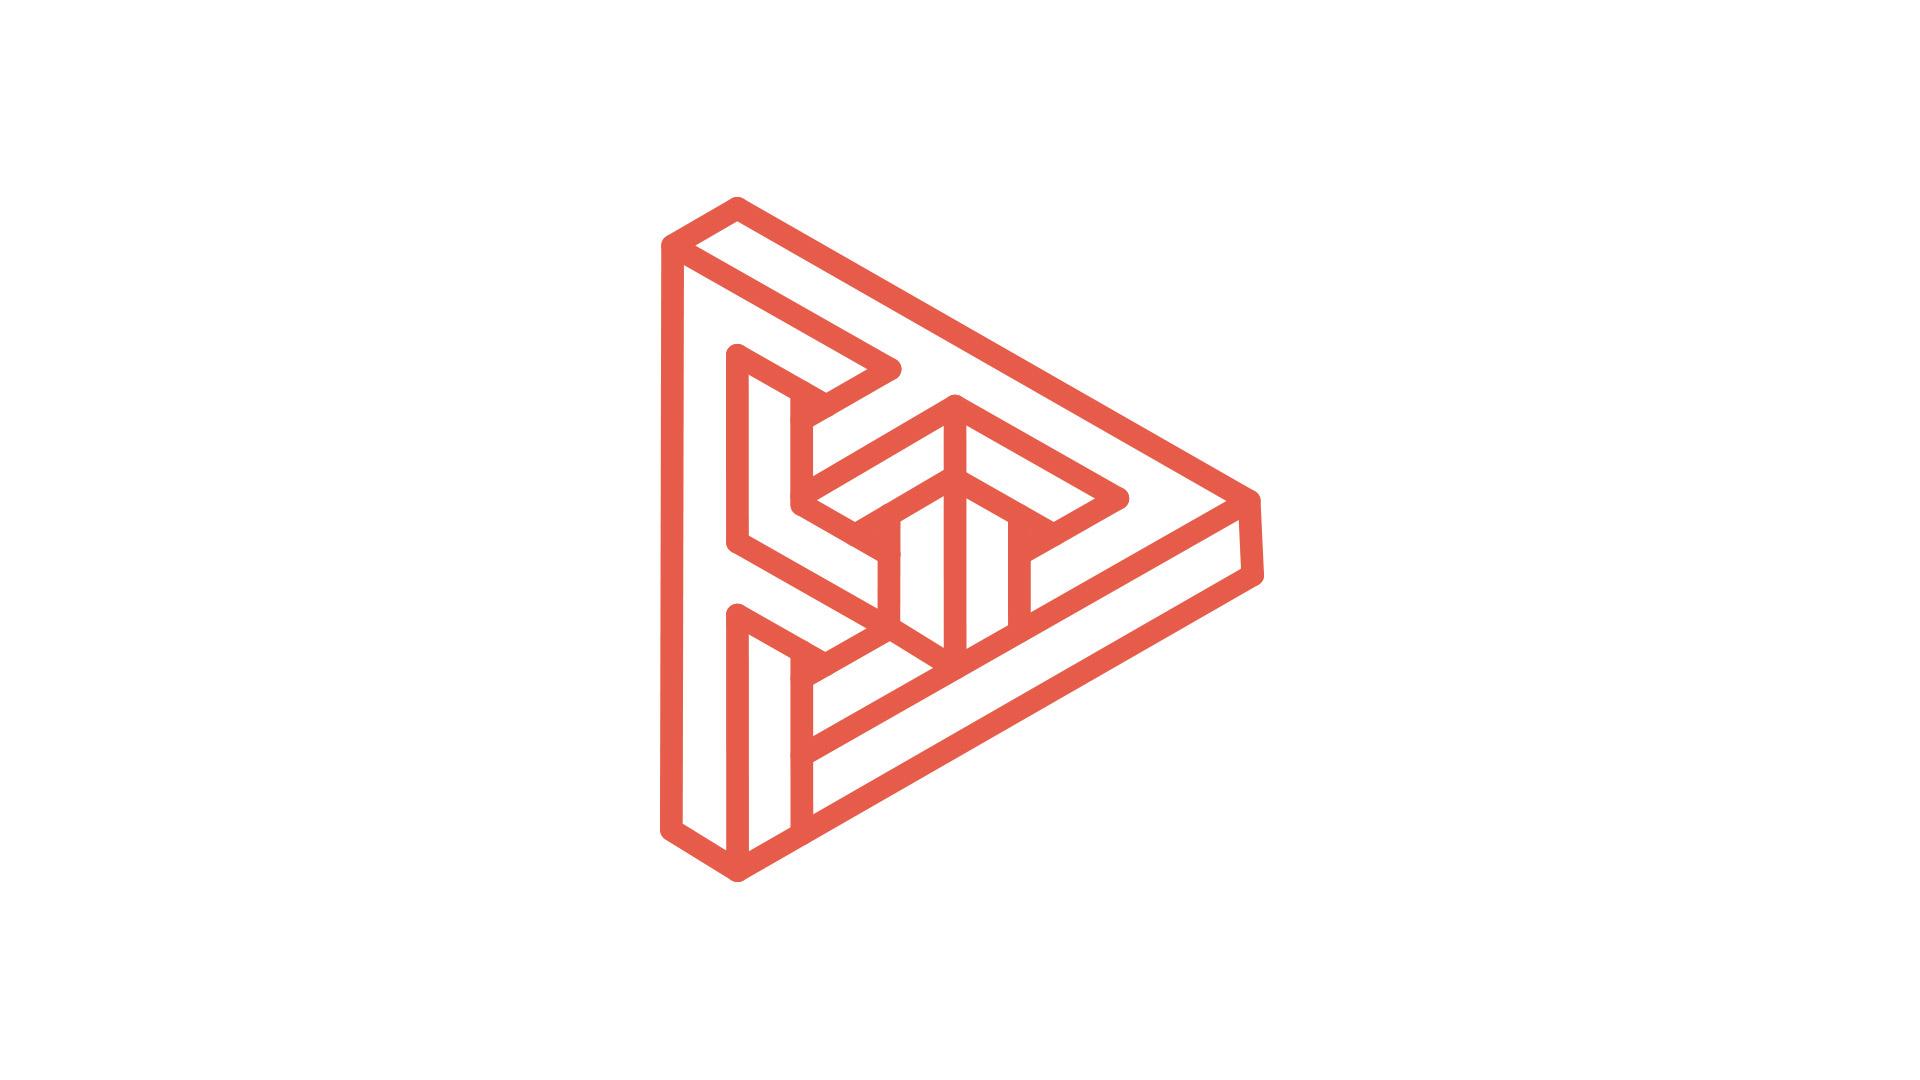 Rendering Surprising Futures Design Words